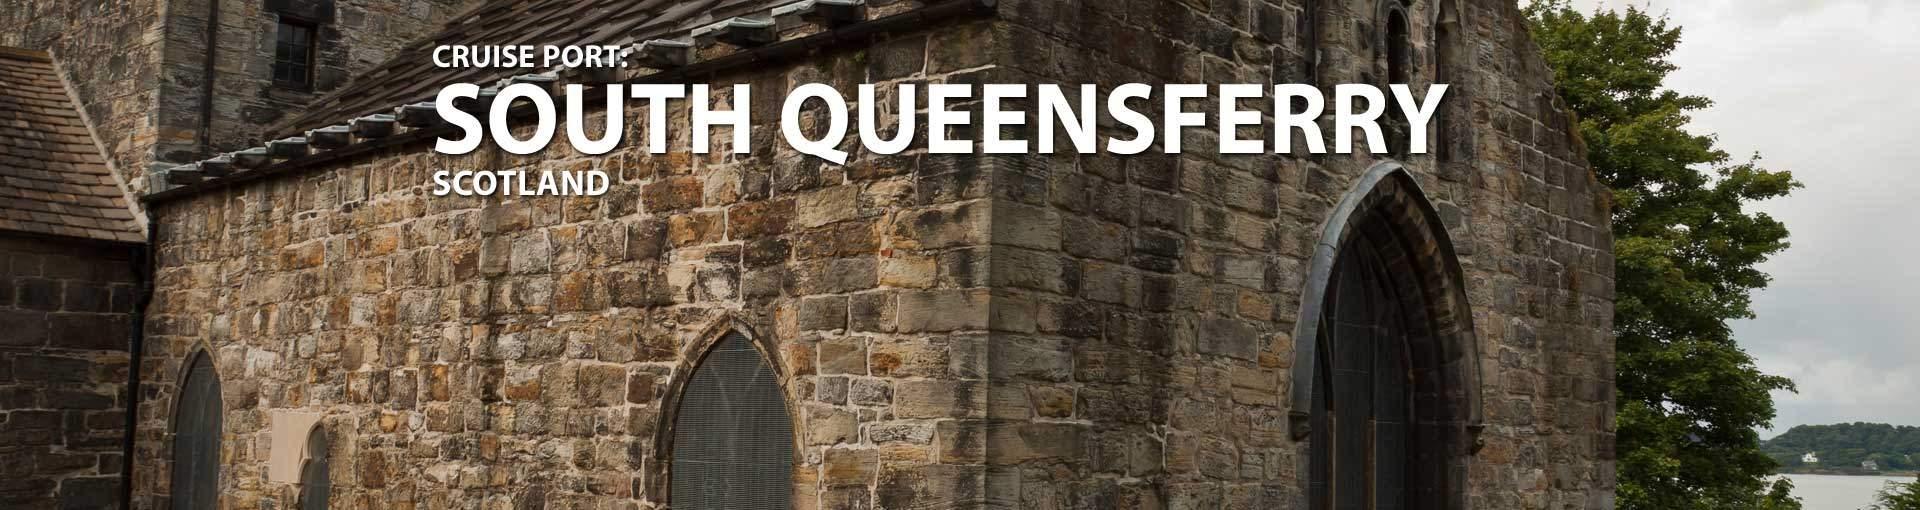 Cruises to S. Queensferry, Scotland